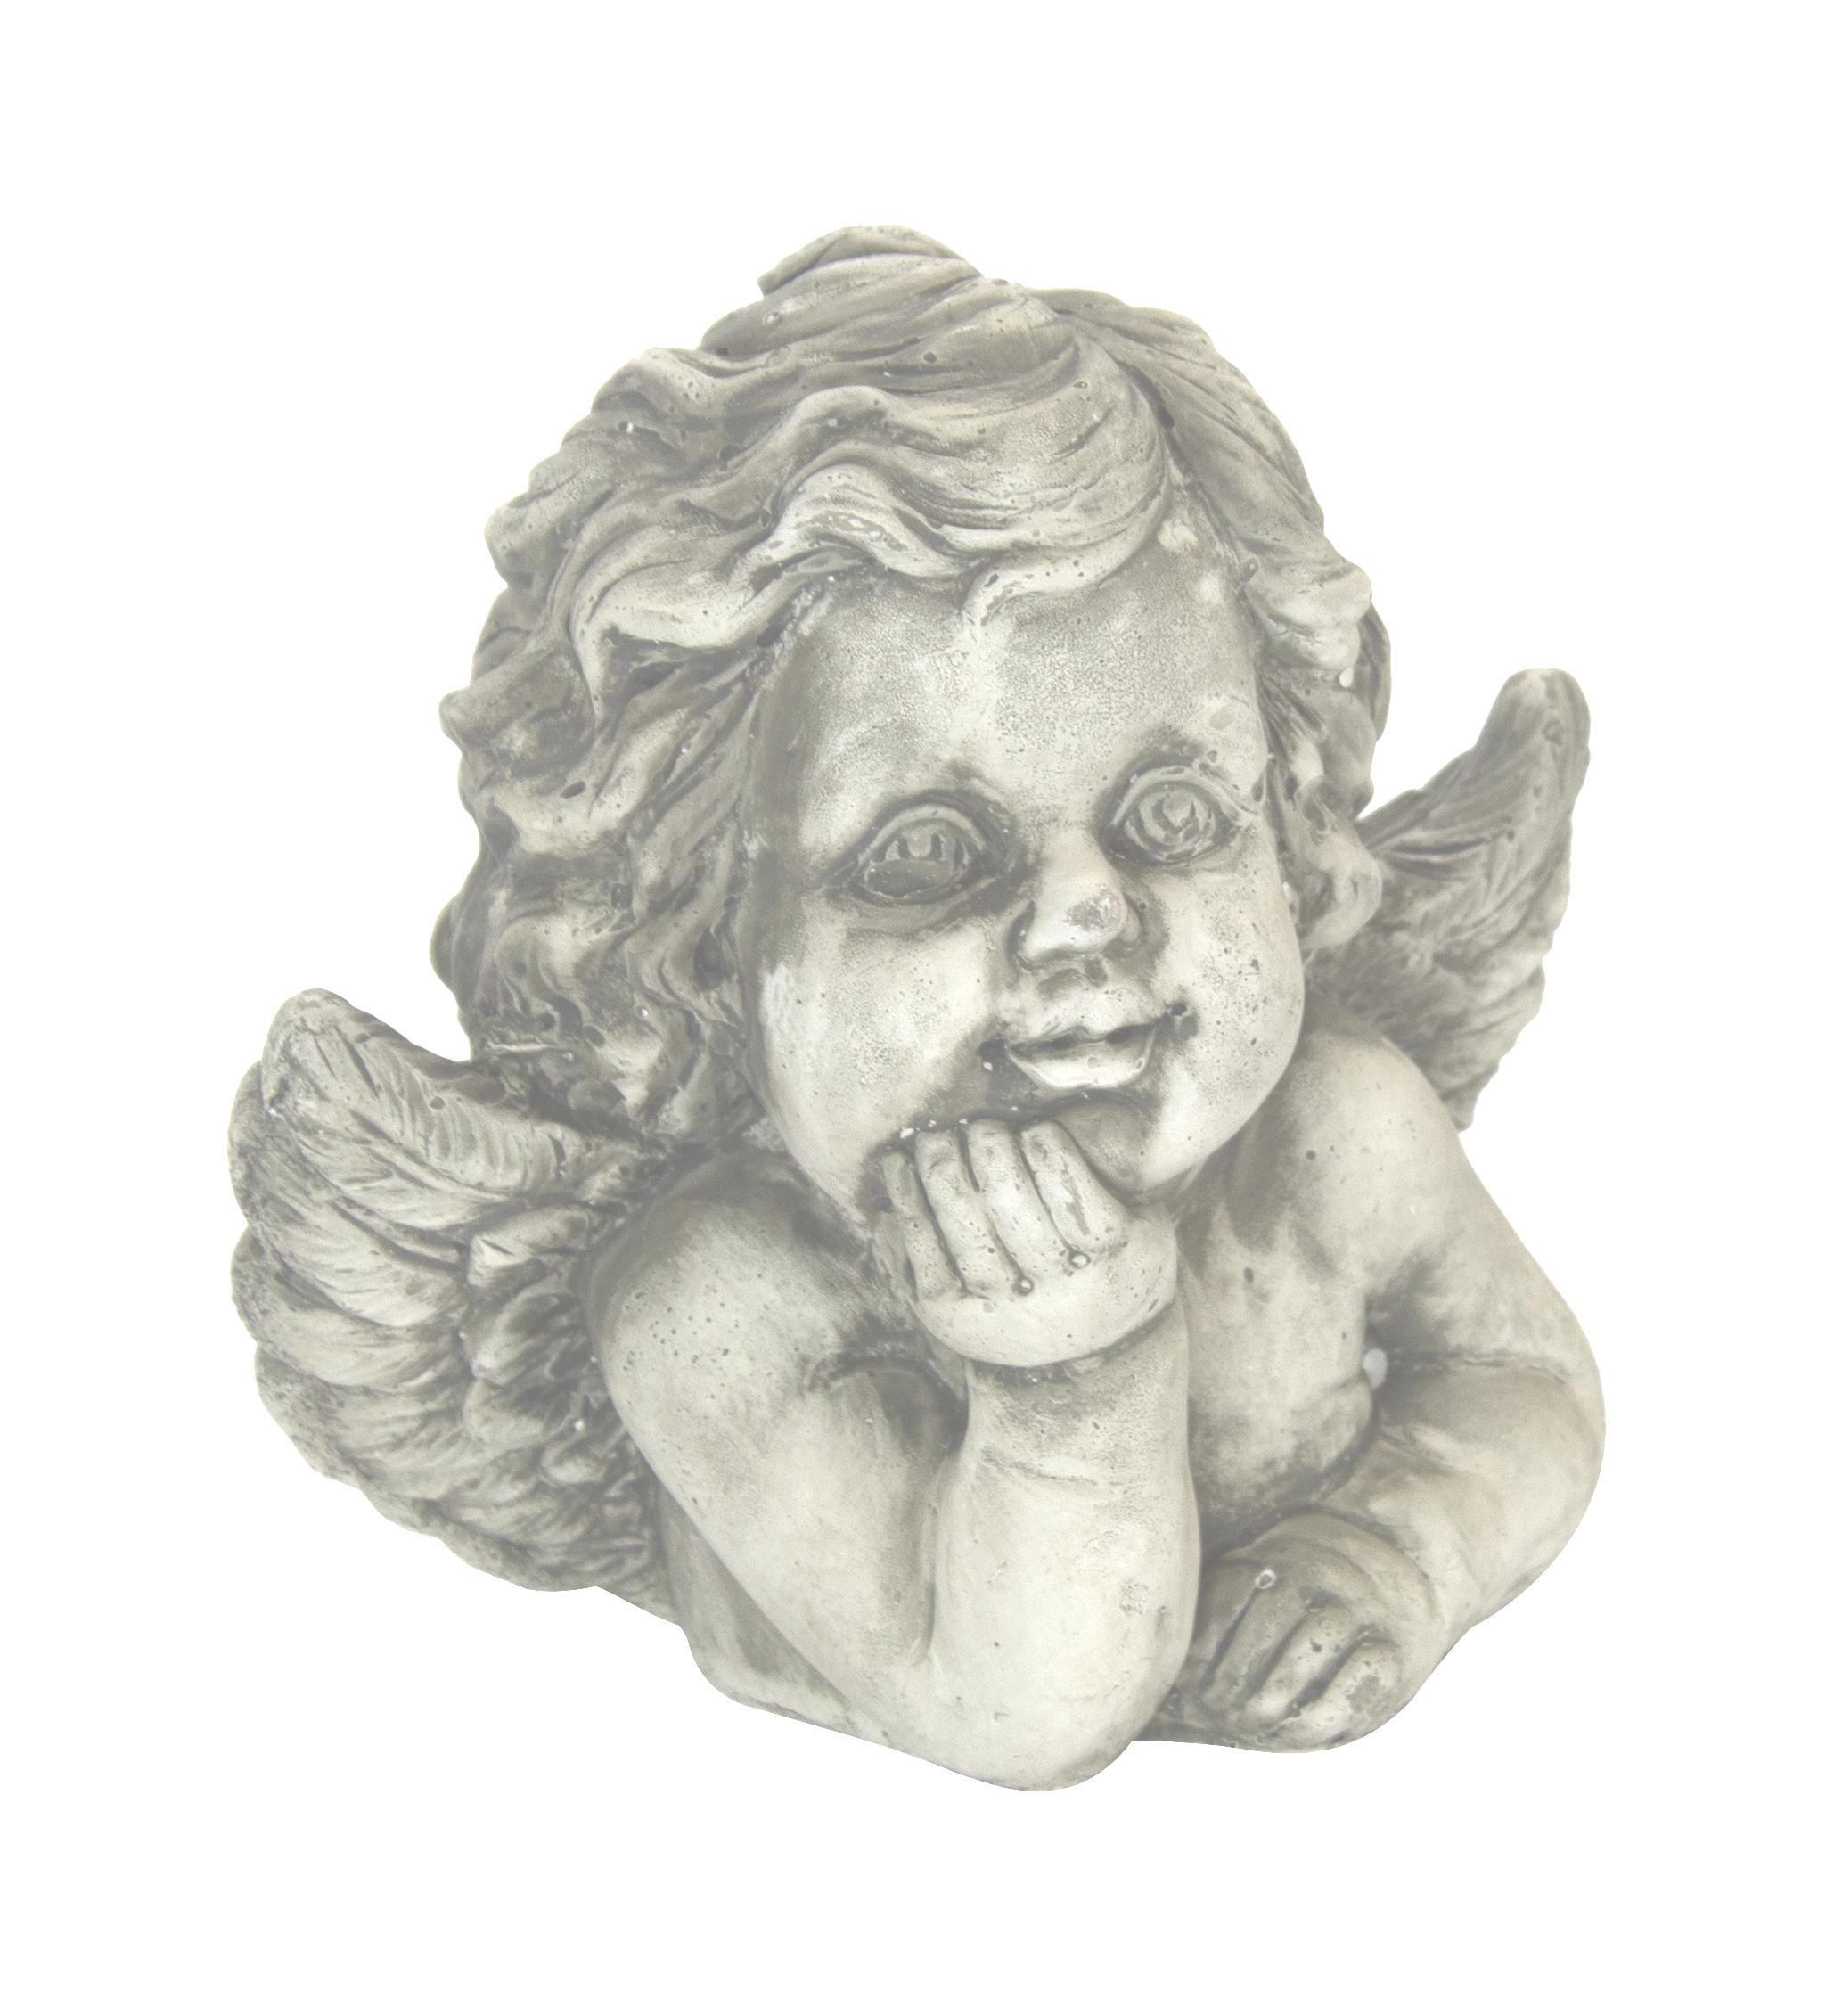 Decorative Angel Earthenware-Grave Angel Garden Figurine Gartendeko grabdeko